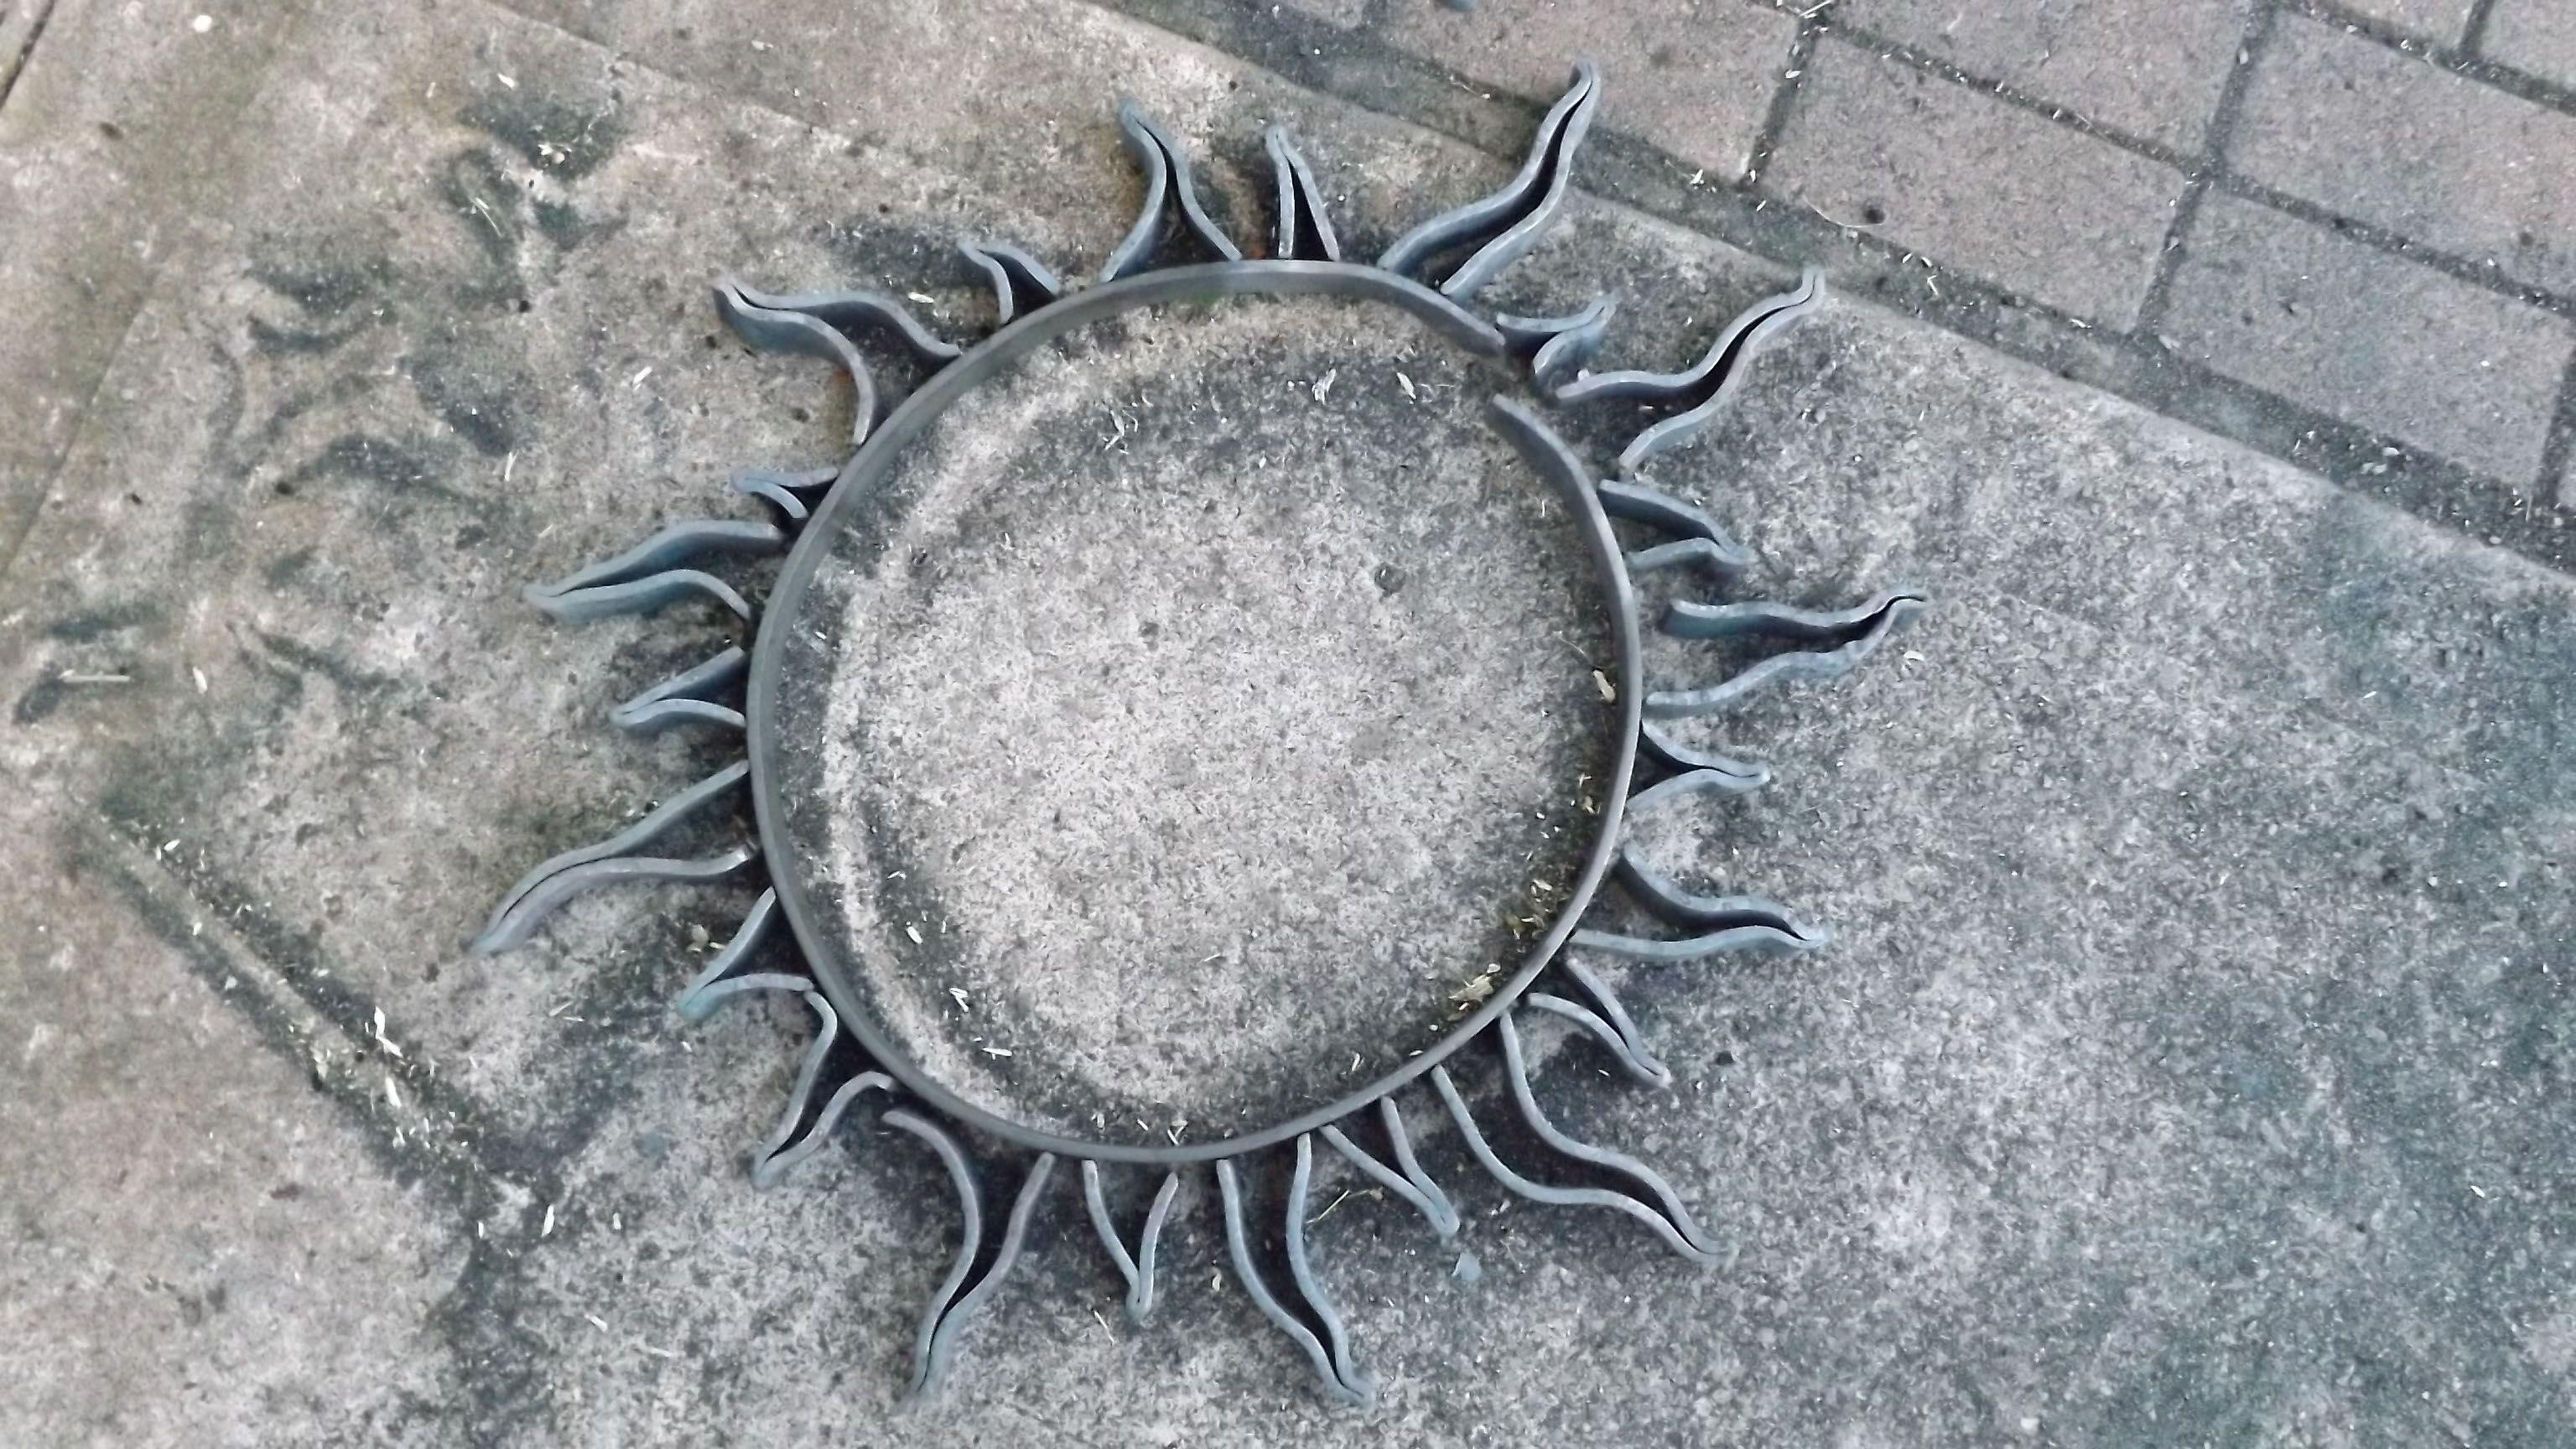 Sun & Moon Bed /arc angel welding